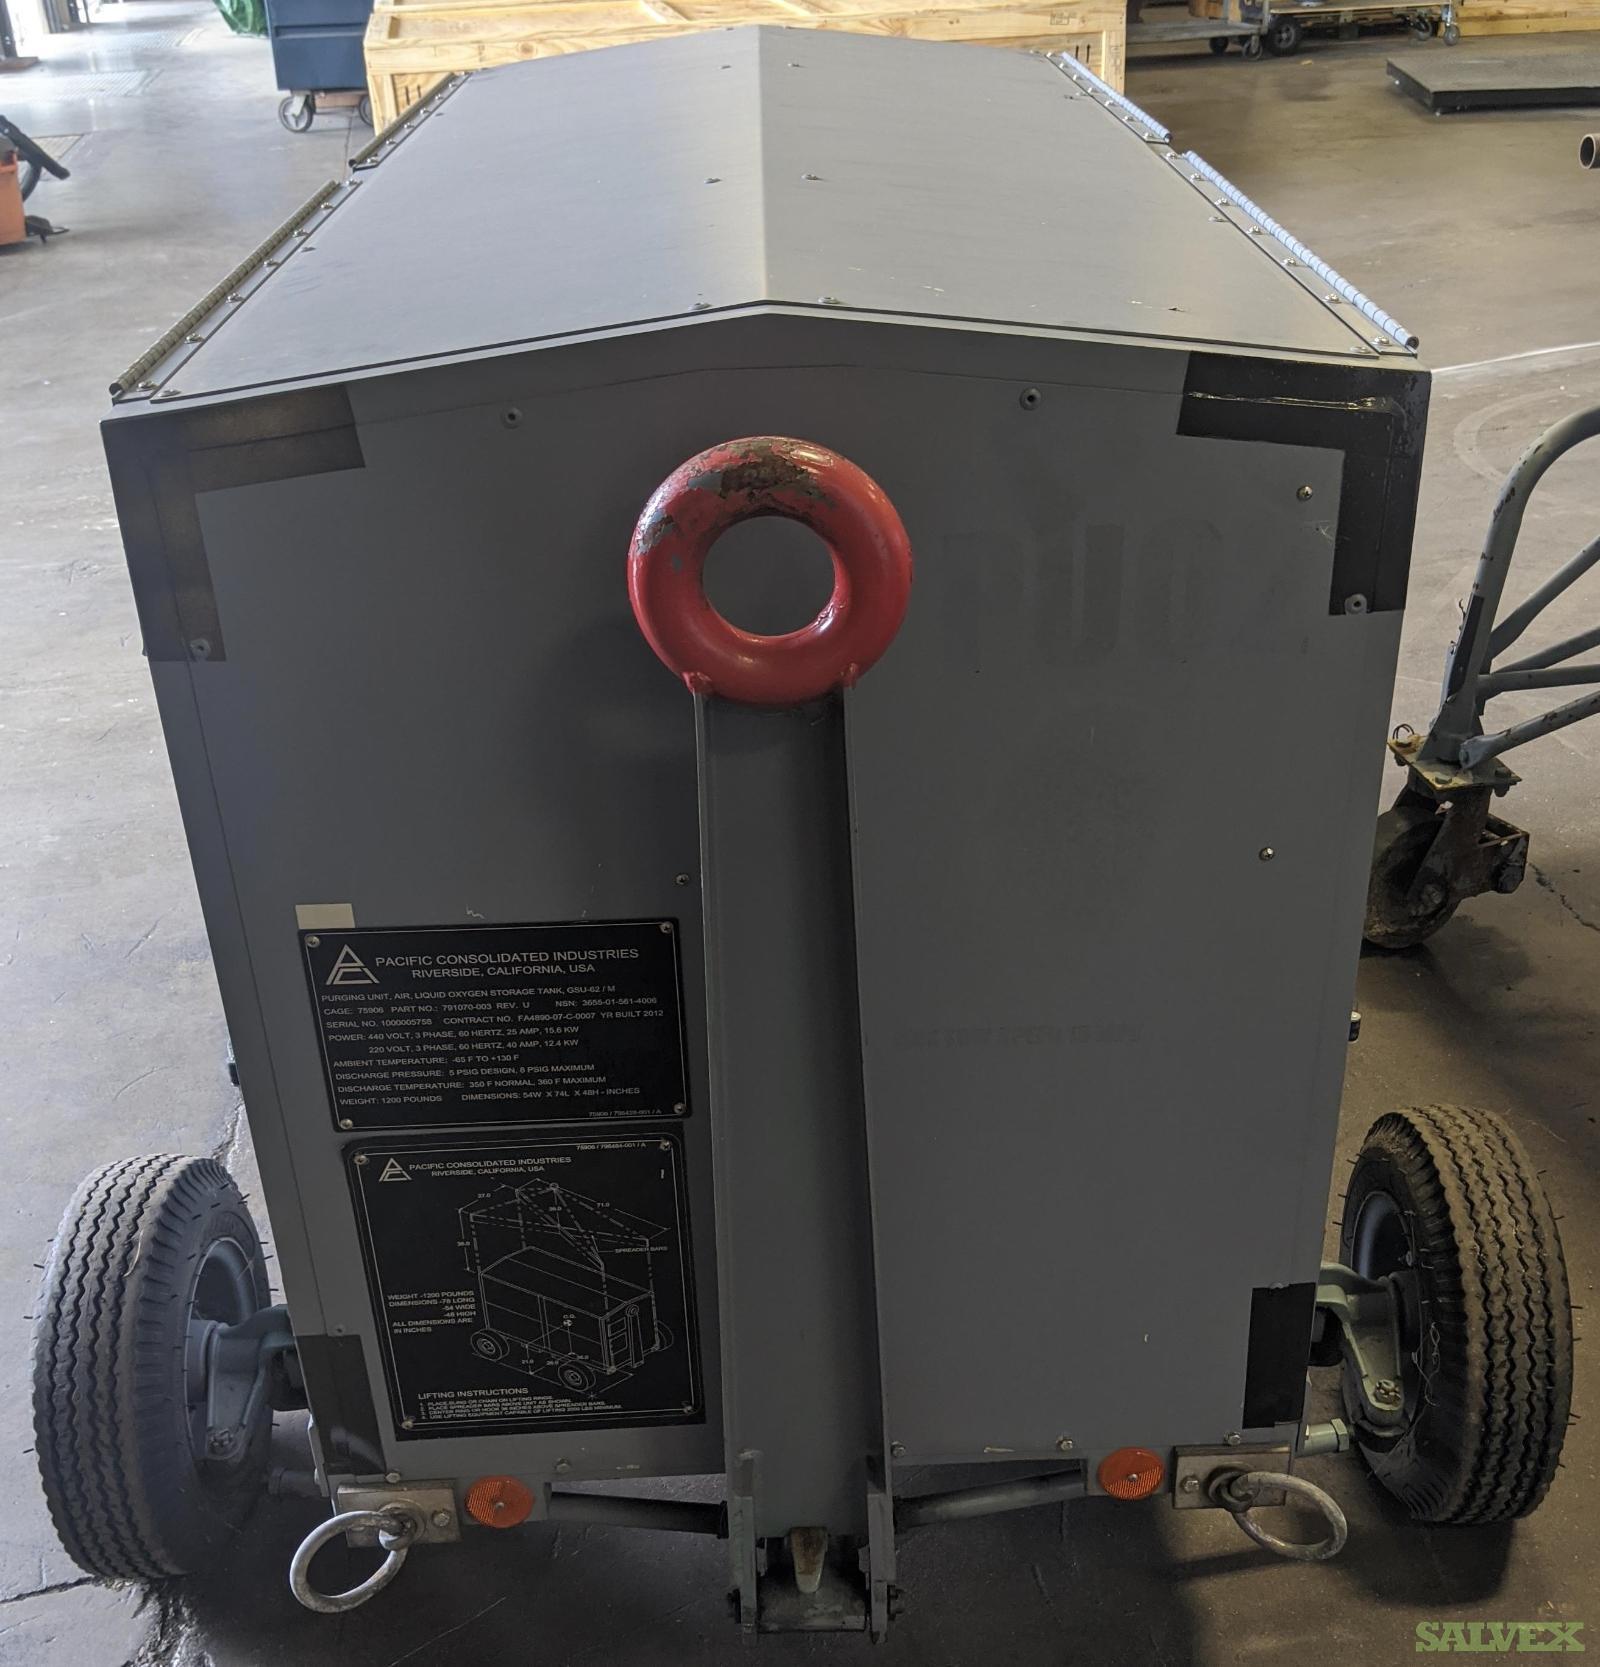 Pacific Consolidated Industries GSU-62/M Liquid Oxygen Purging Unit